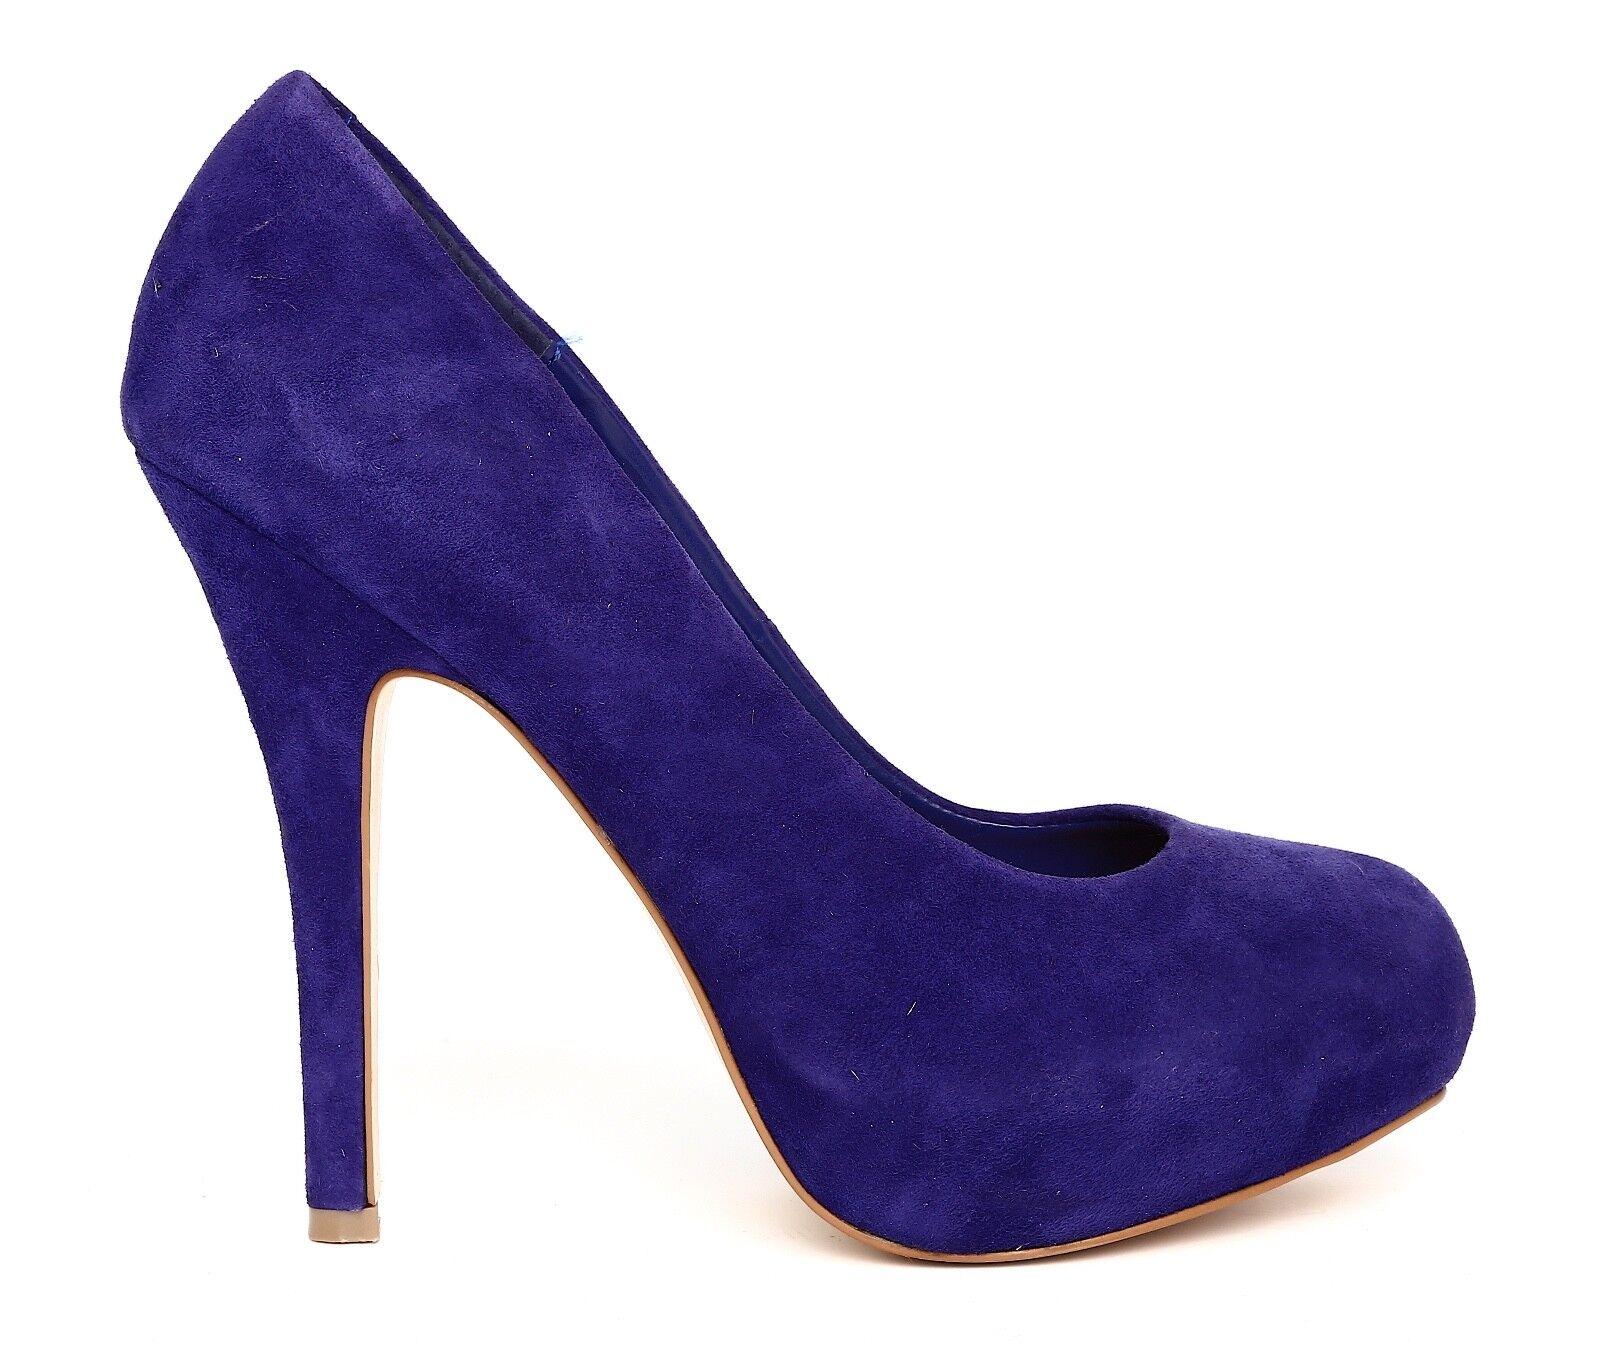 Steve Madden Traisie Purple Suede Leder Heels Damenschuhe Platform High Heels Leder Sz 7.5 1128 7129a4